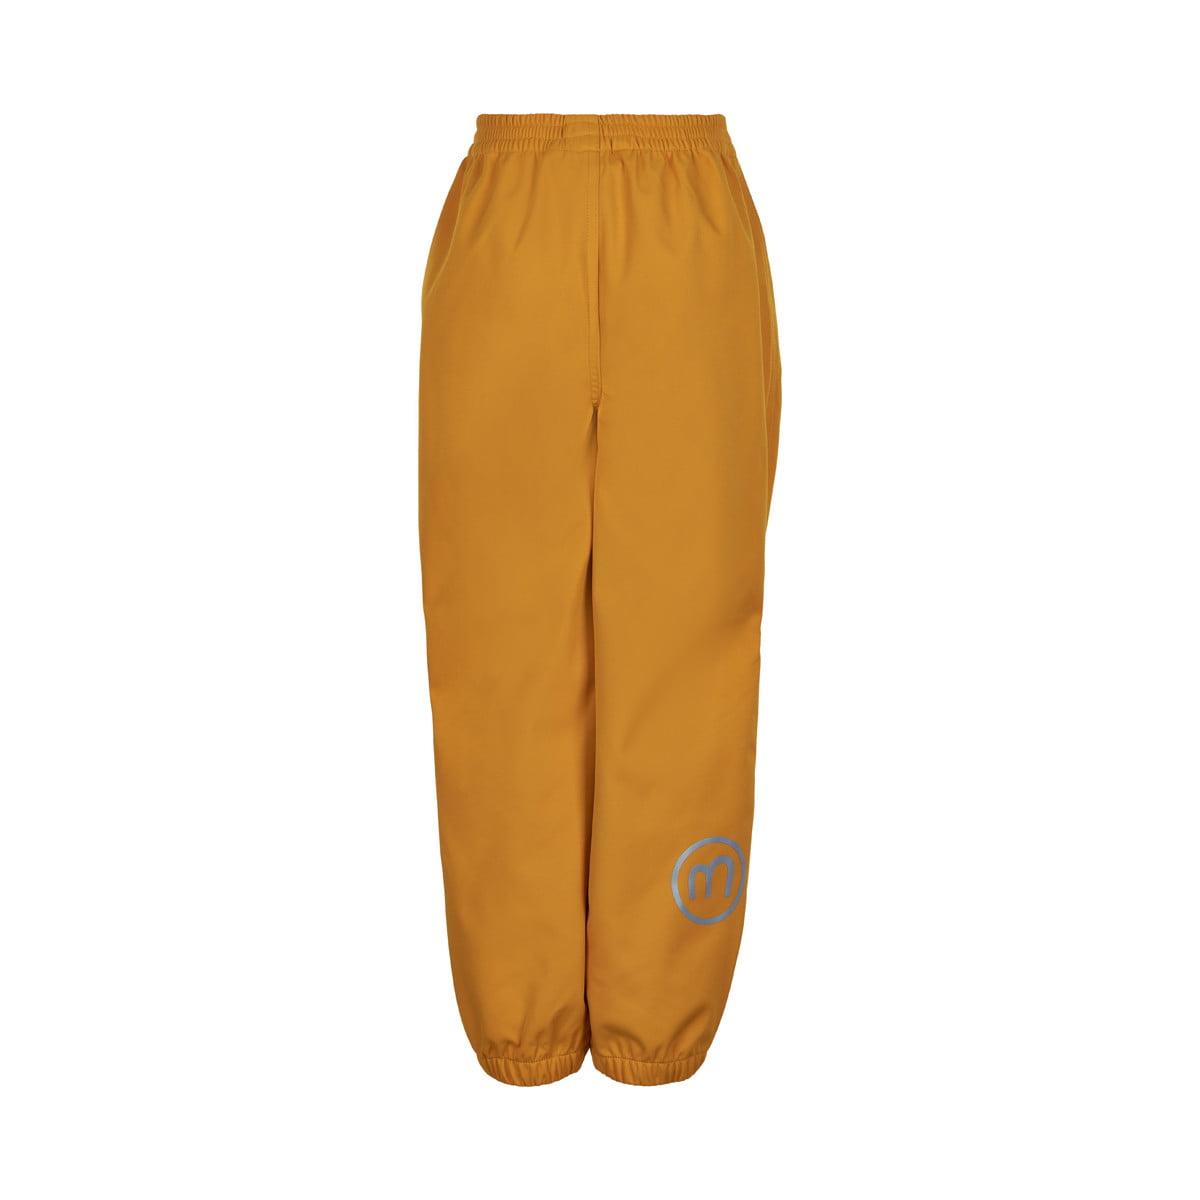 Pantaloni de ploaie și vânt (impermeabili) din softshell Golden Orange Minymo 2